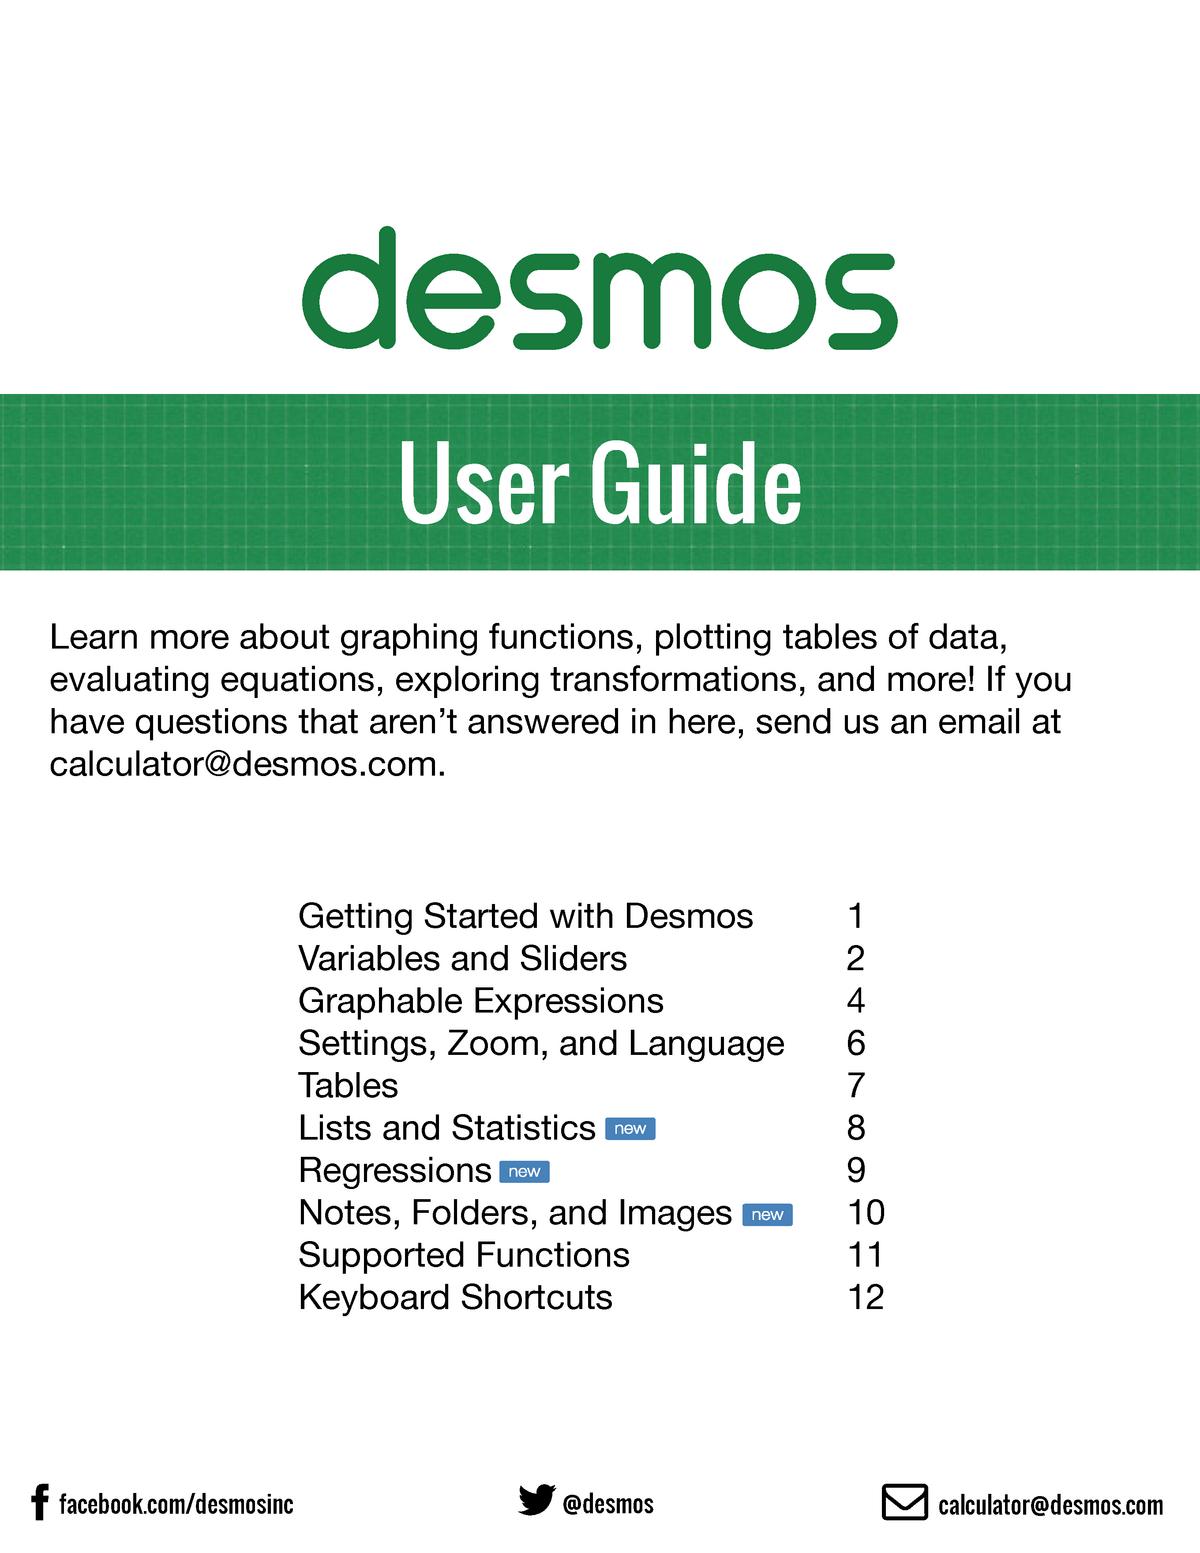 Desmos Calculator User Guide - Math 3301 - Lamar University